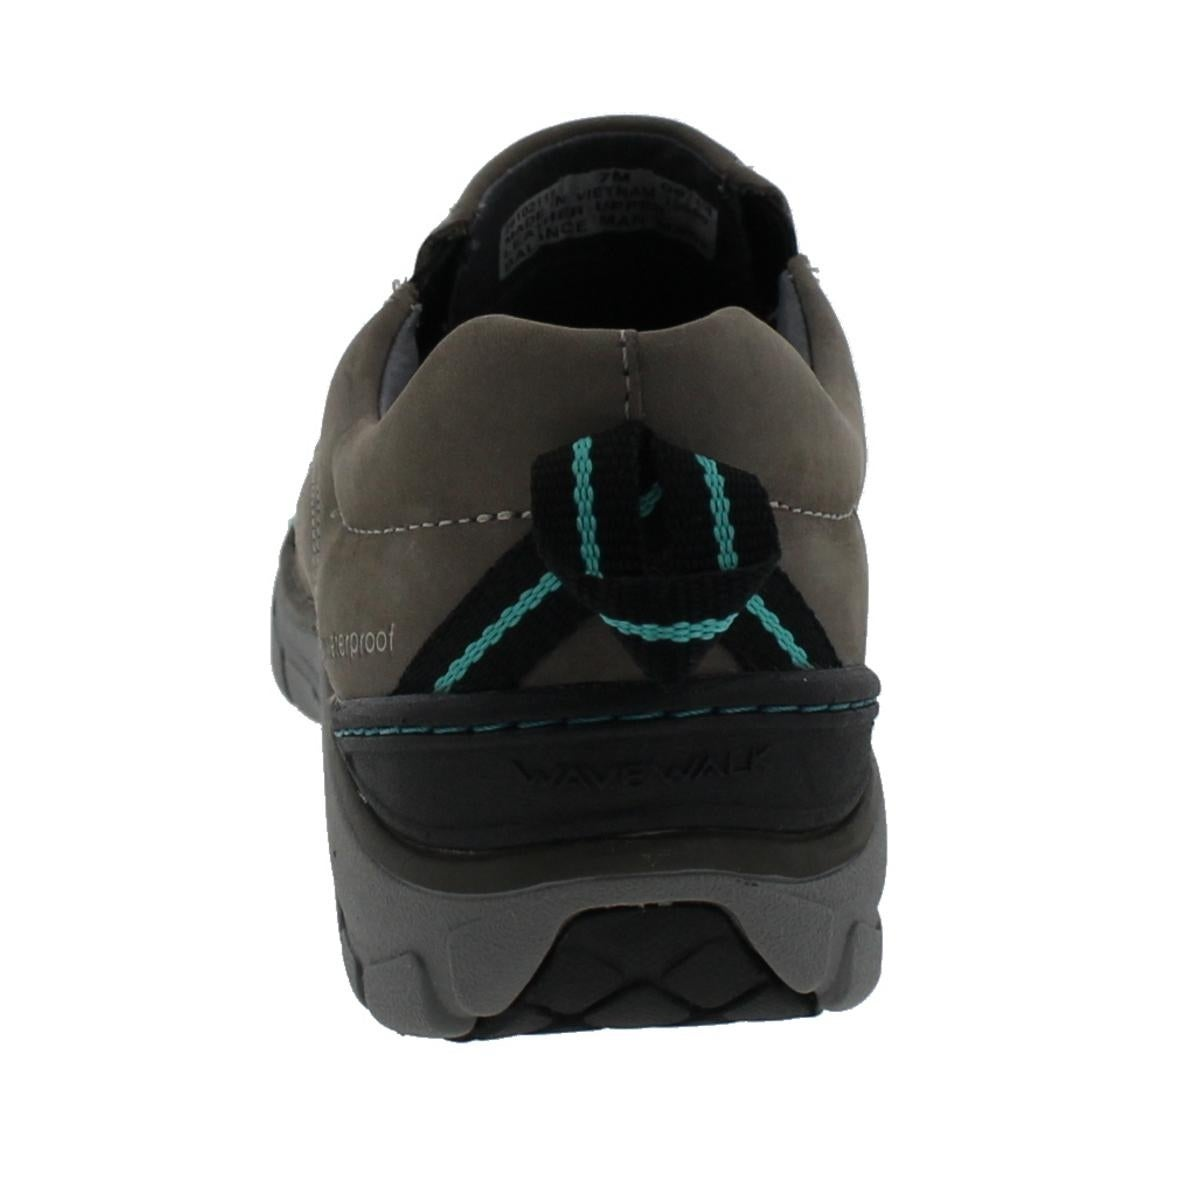 9f51f2f35b0 Shop Clarks Womens Wave Brook Walking Shoes Leather Waterproof - 7 medium (b